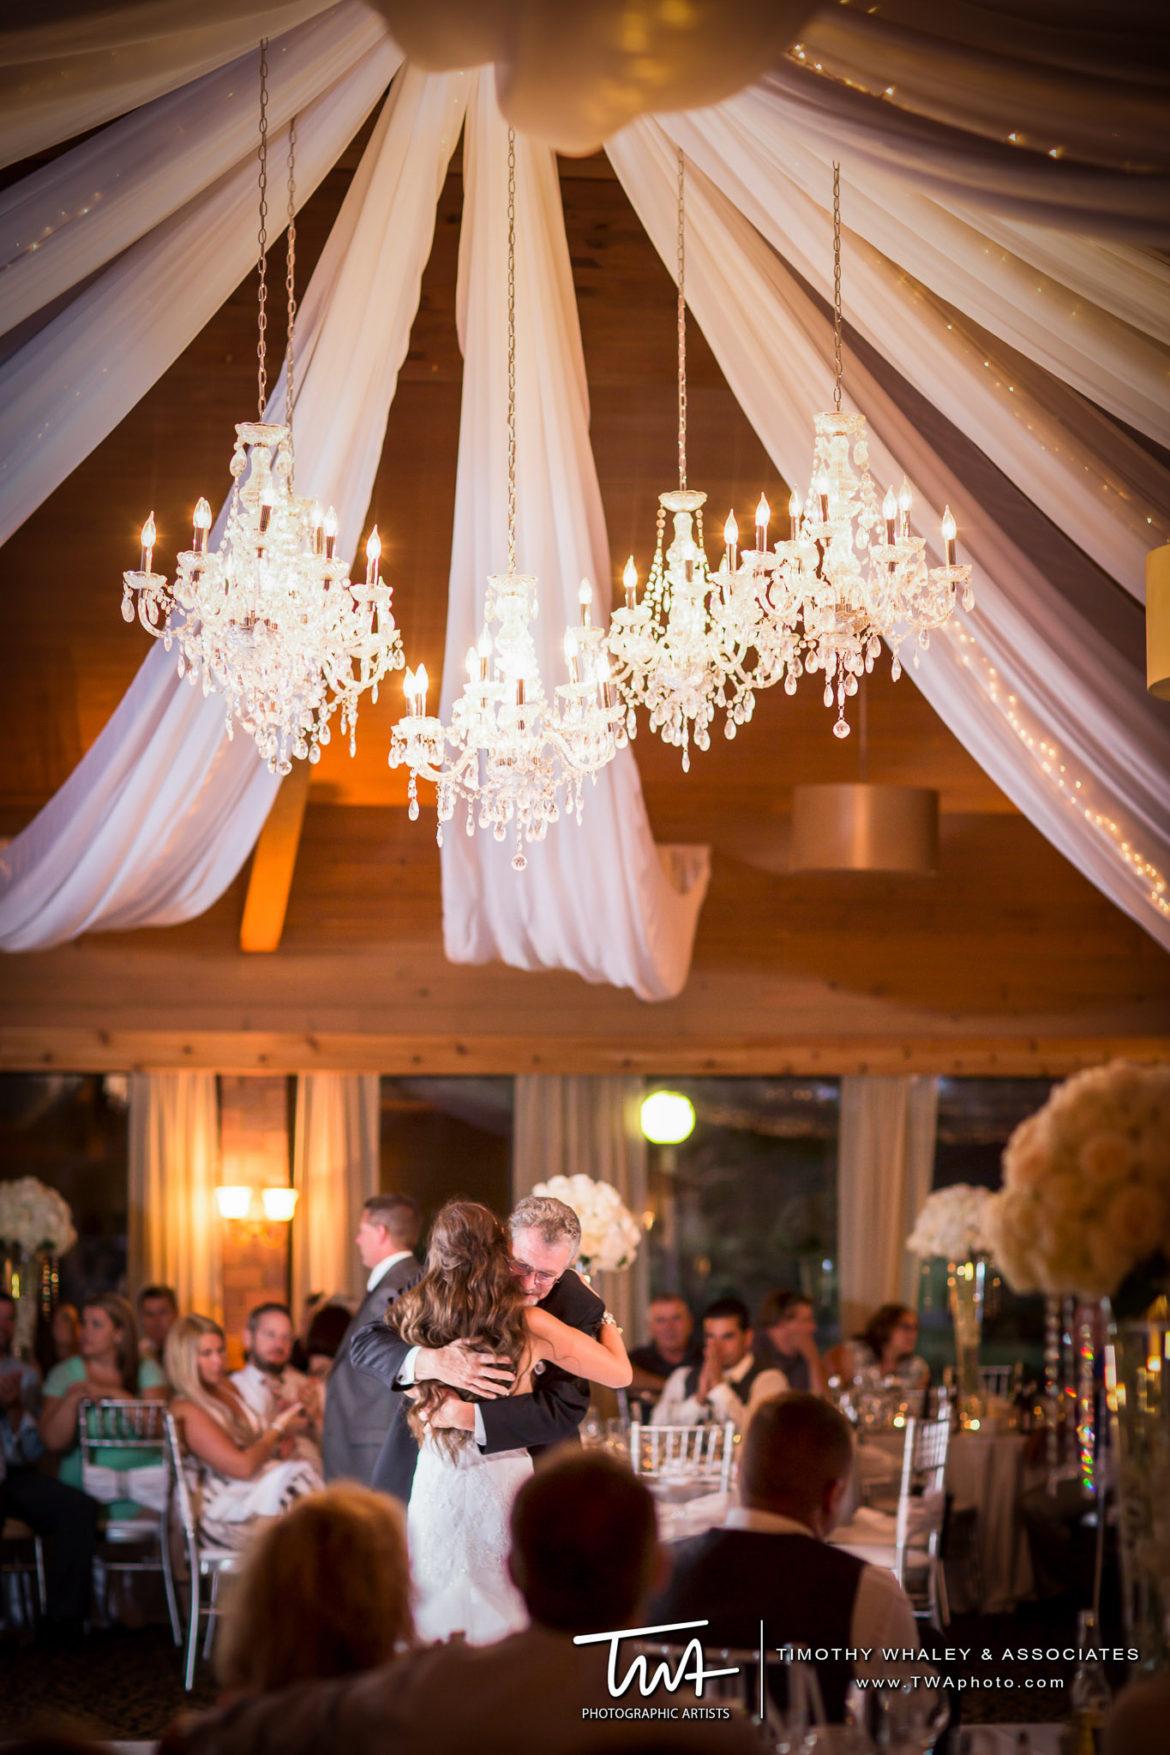 Elegant_Event_Lighting_Chicago_Kemper_Lakes_Kildeer_Wedding_Ceiling_Drapes_String_Lighting_Crystal_Chandeliers